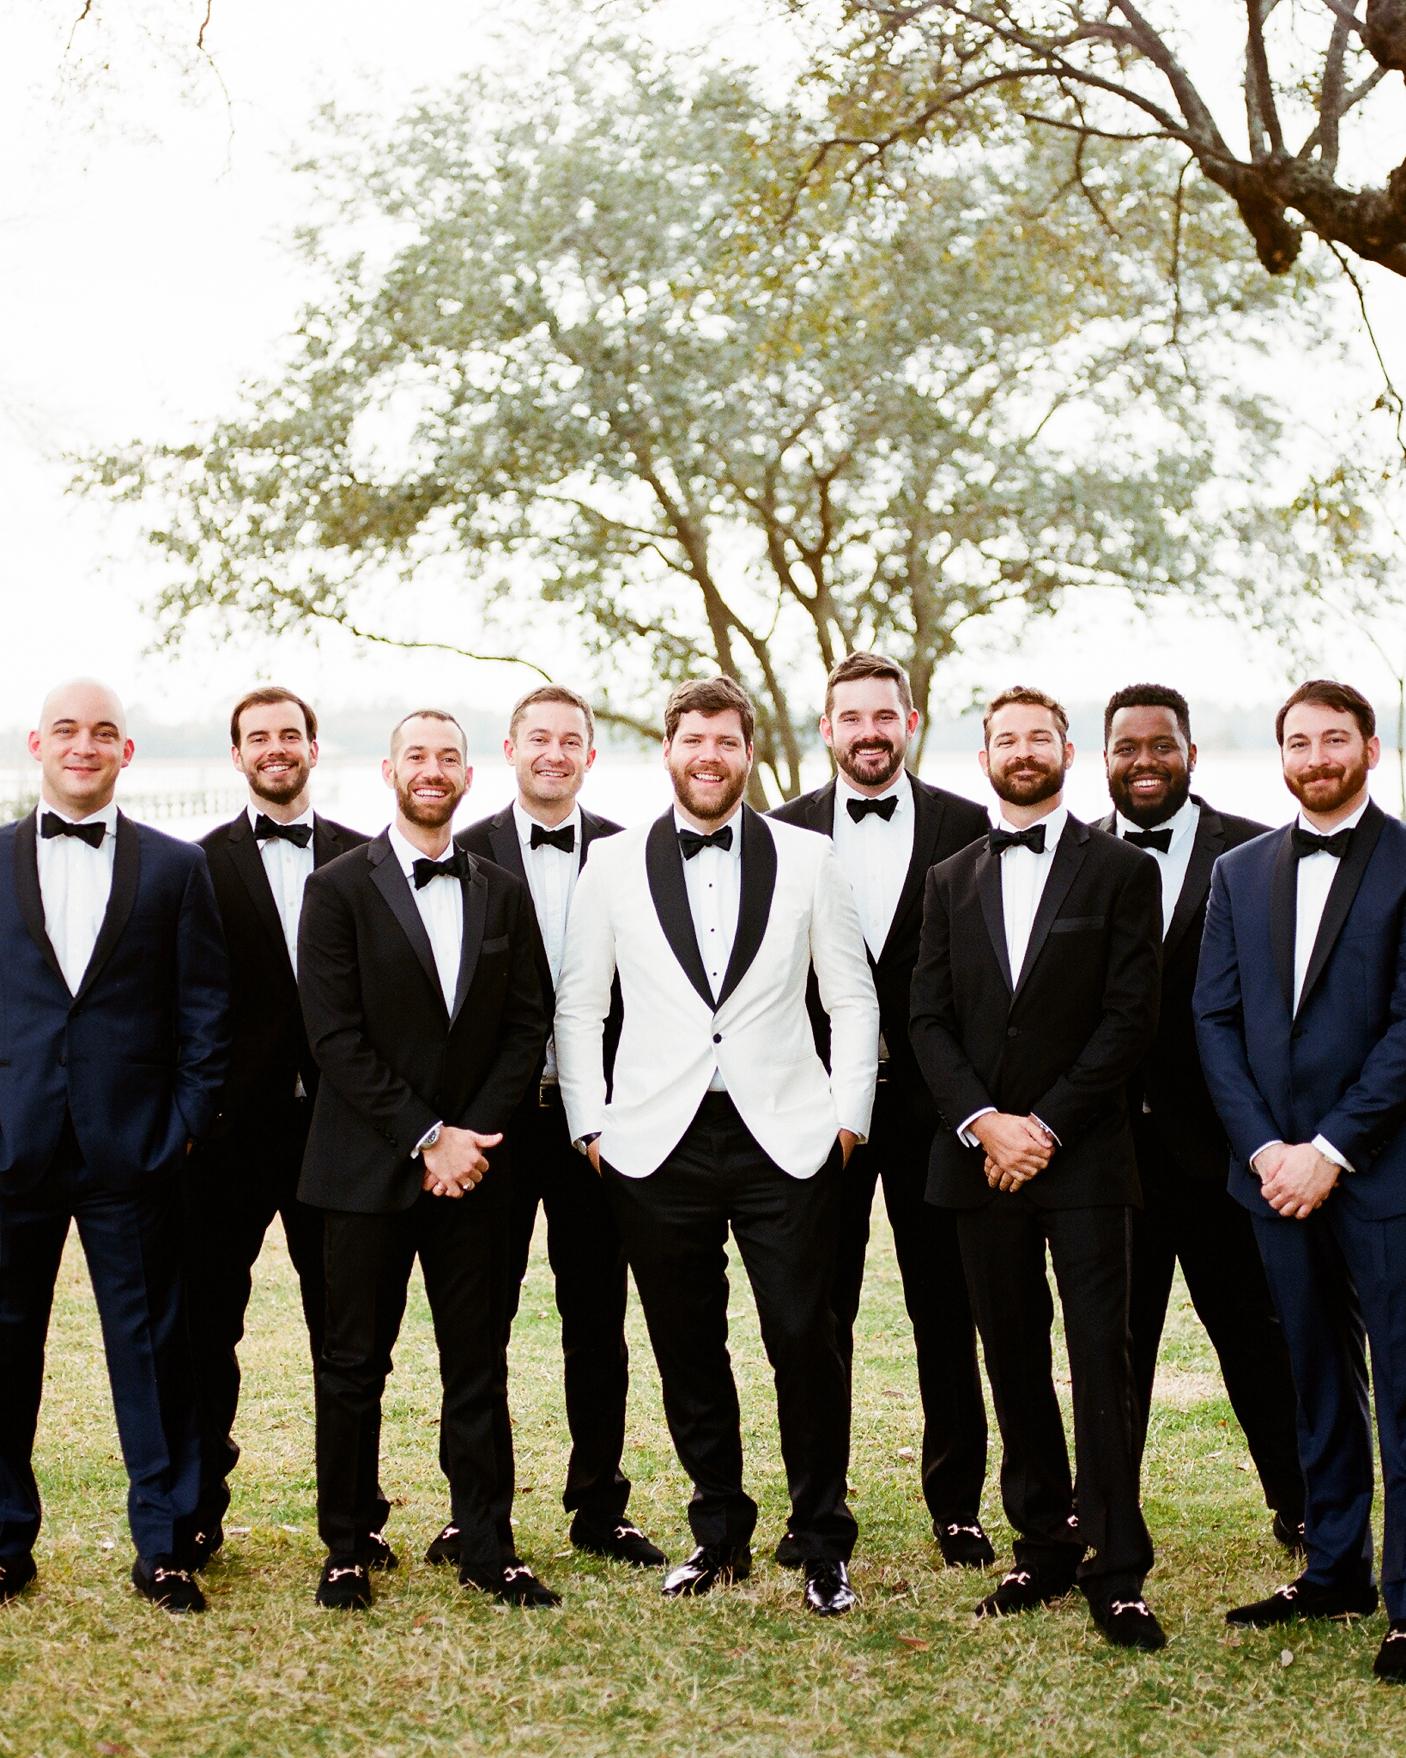 hamida charlie charleson wedding groomsmen